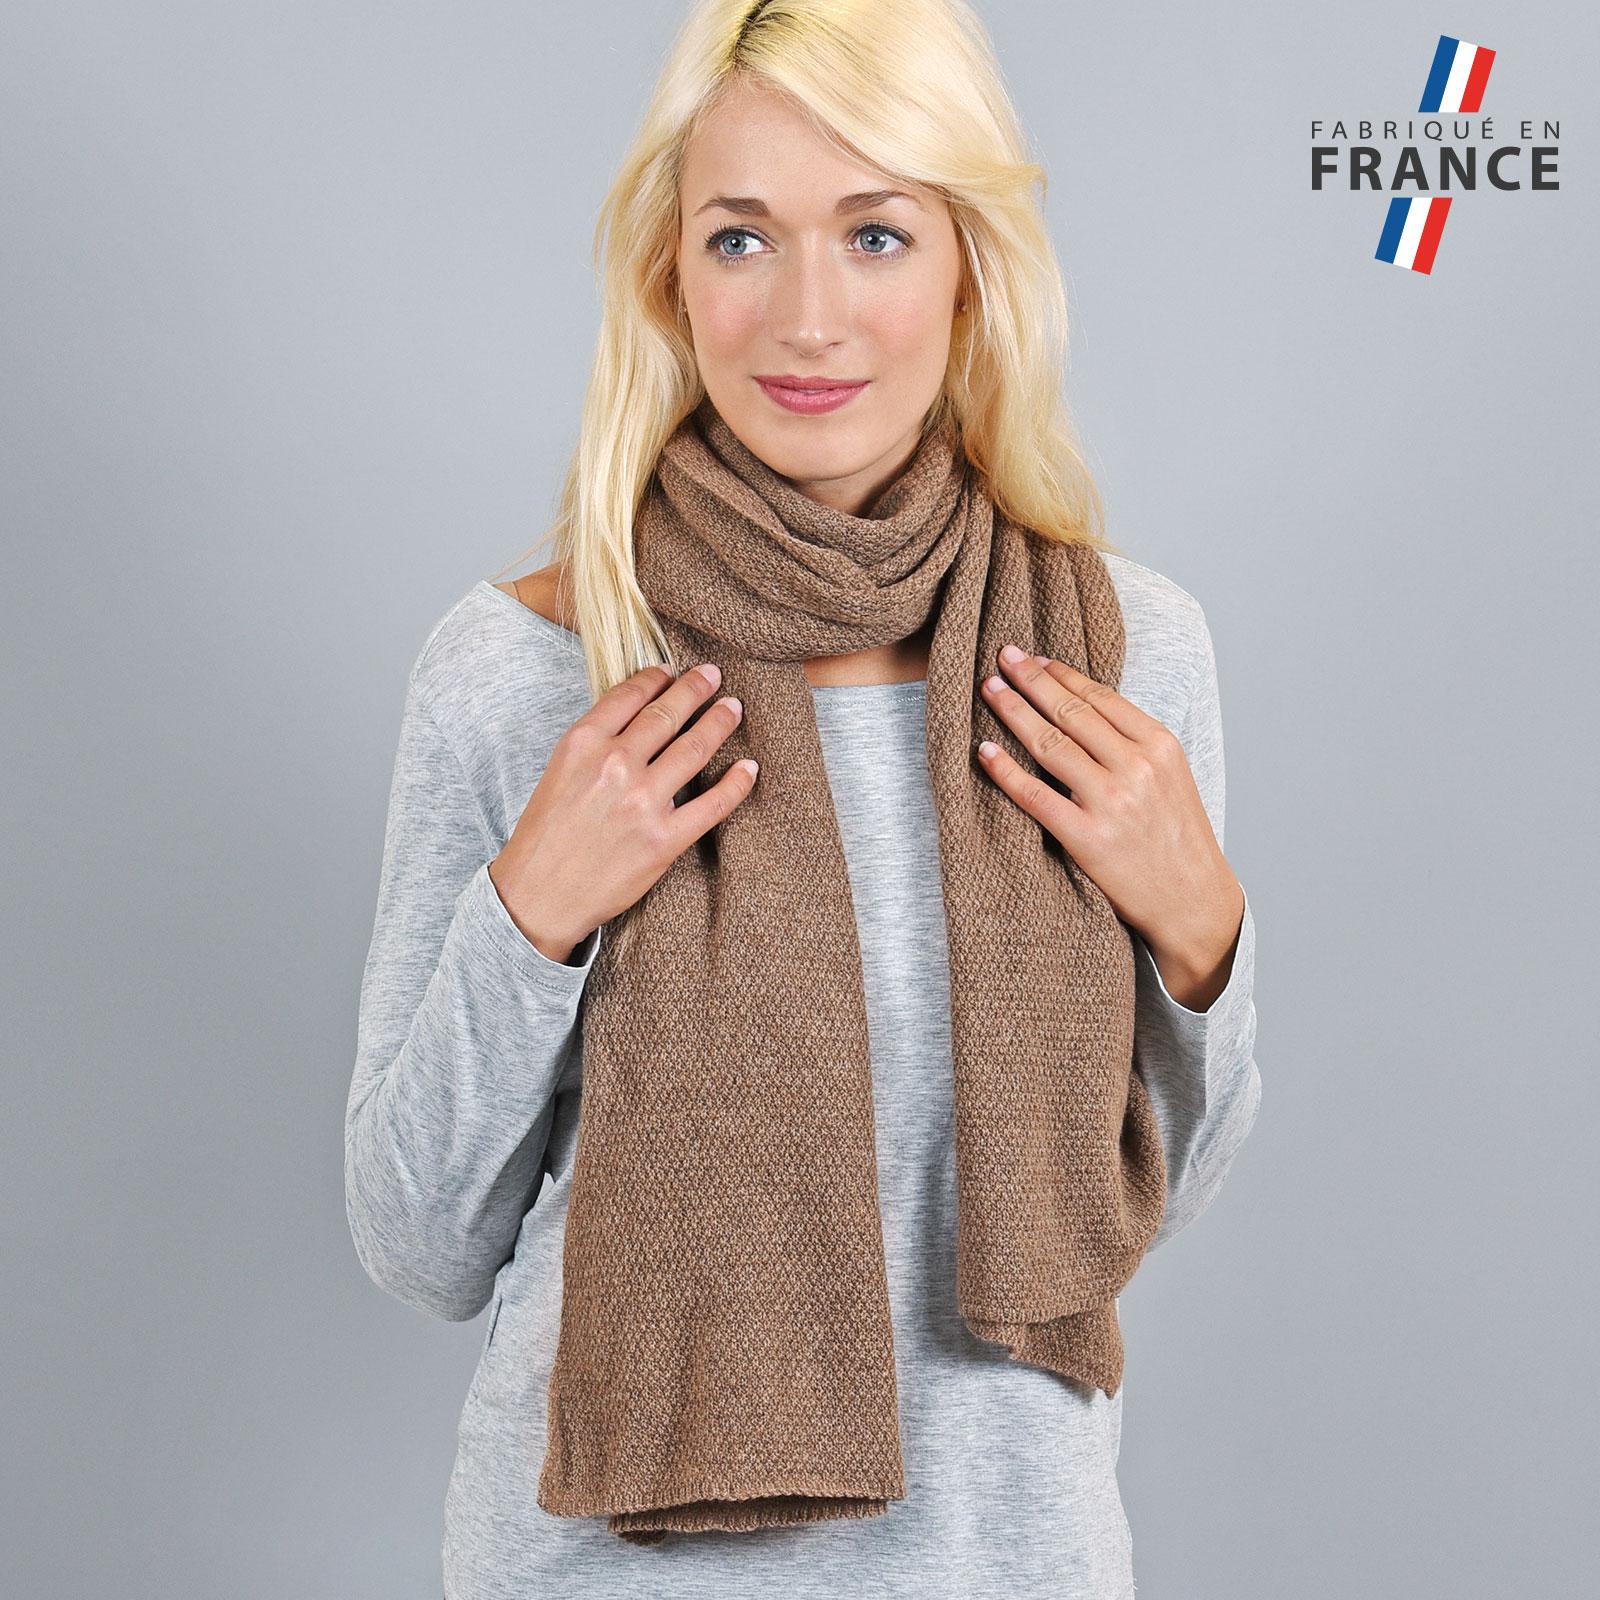 AT-03186-VF16-LB_FR-echarpe-laine-cachemire-taupe-uni-fabrication-francaise